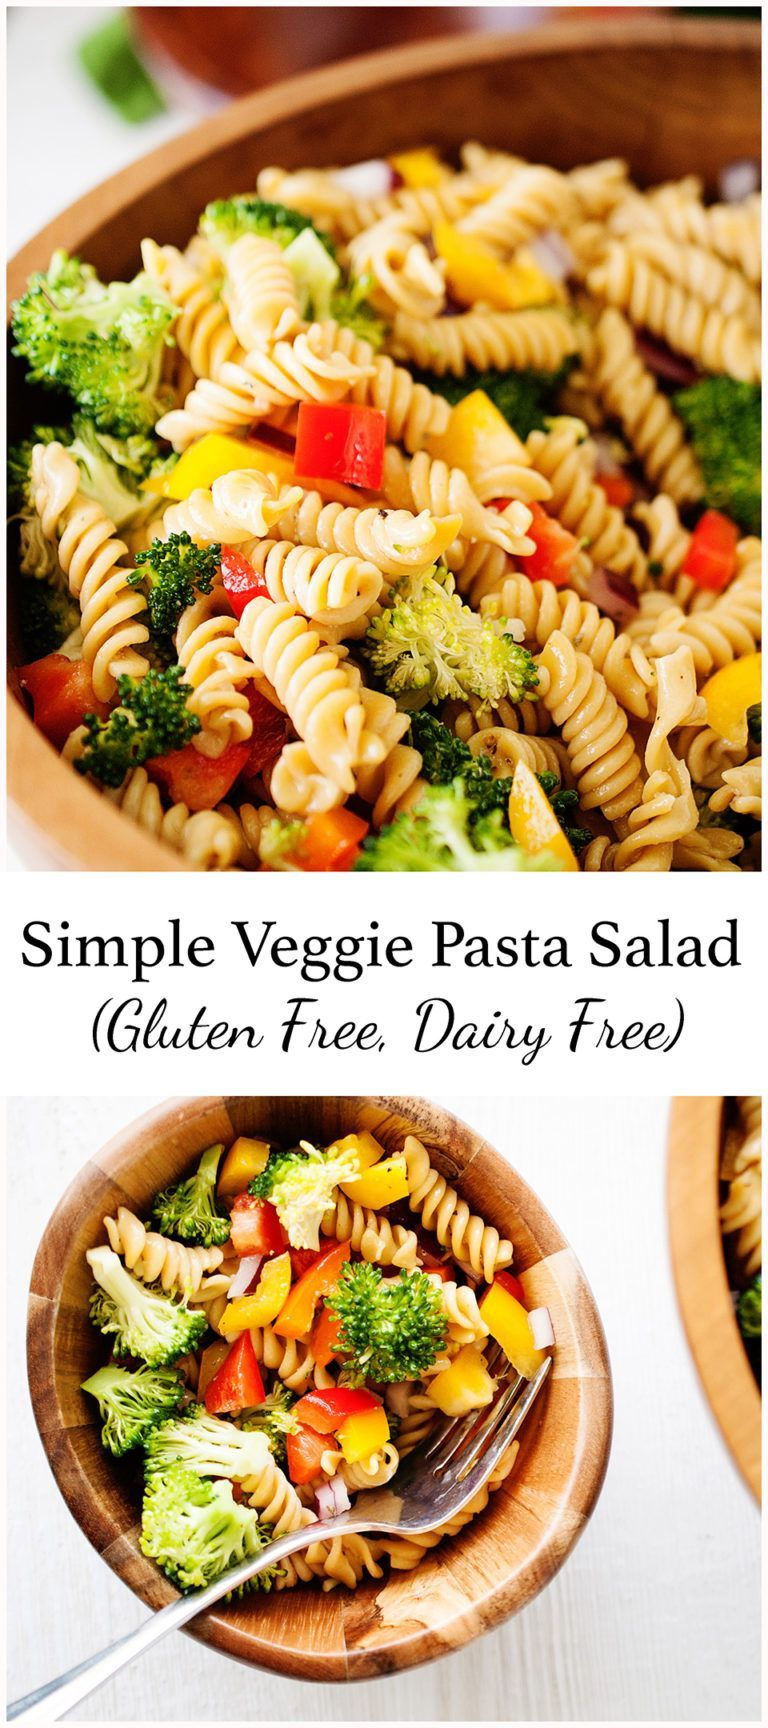 Simple Veggie Pasta Salad (Gluten Free Dairy Free Vegan